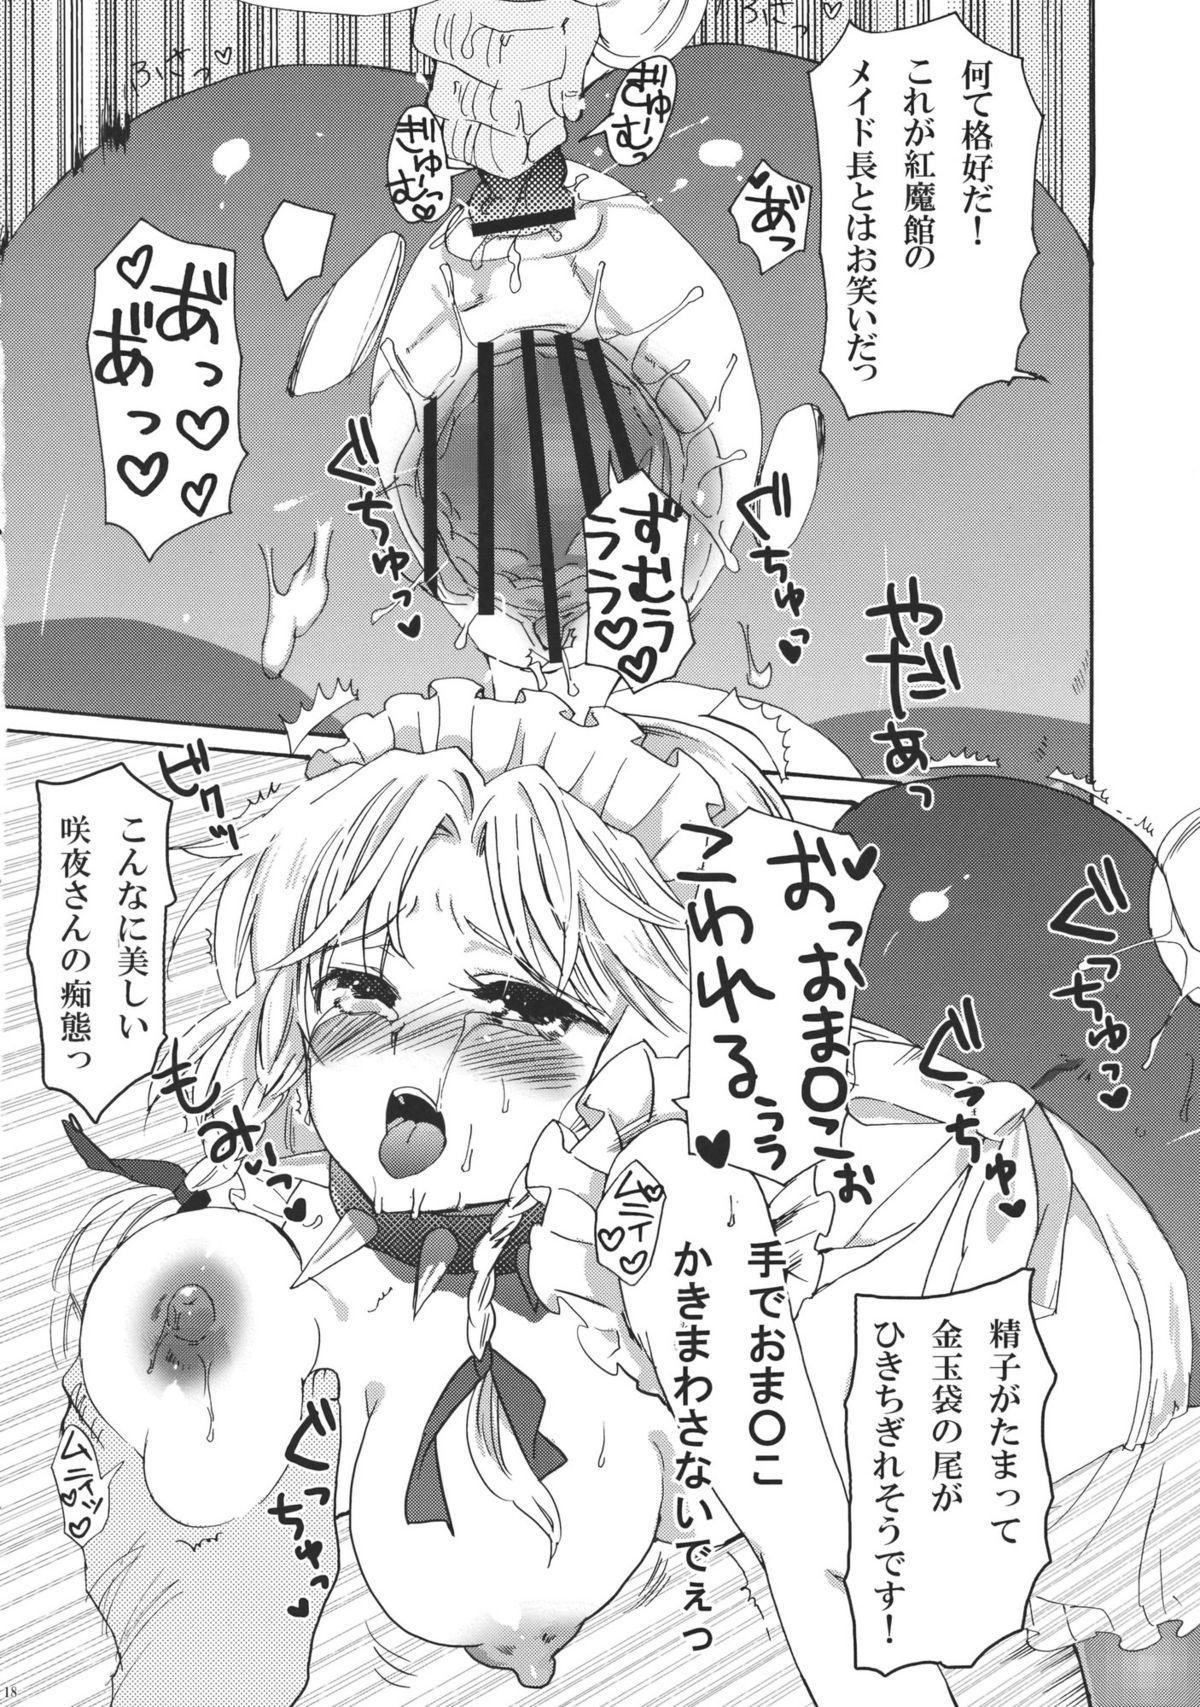 Inu ni Natta Sakuya-san Ge 17